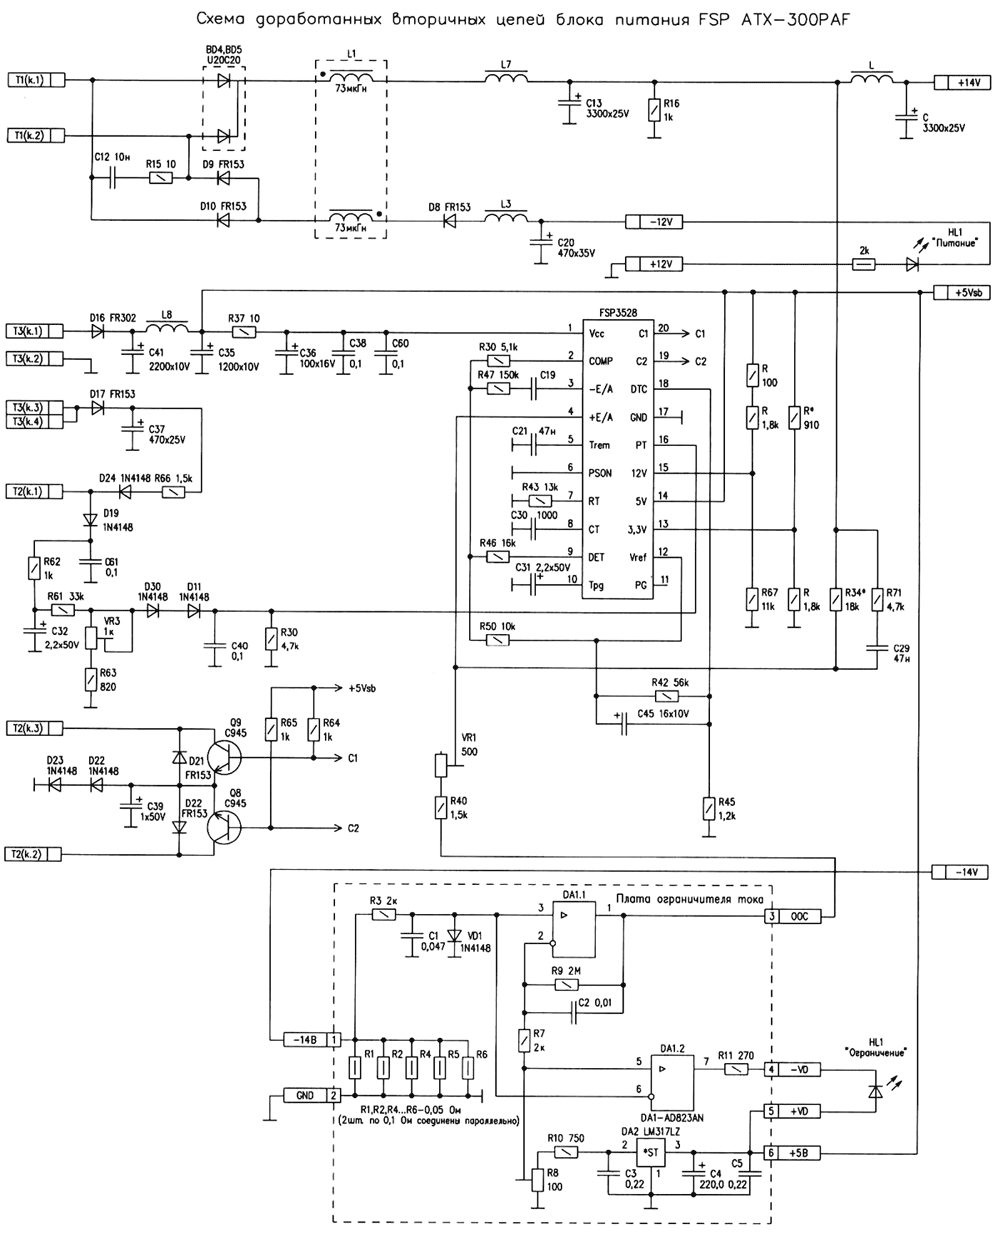 Схема бп fsp group inc